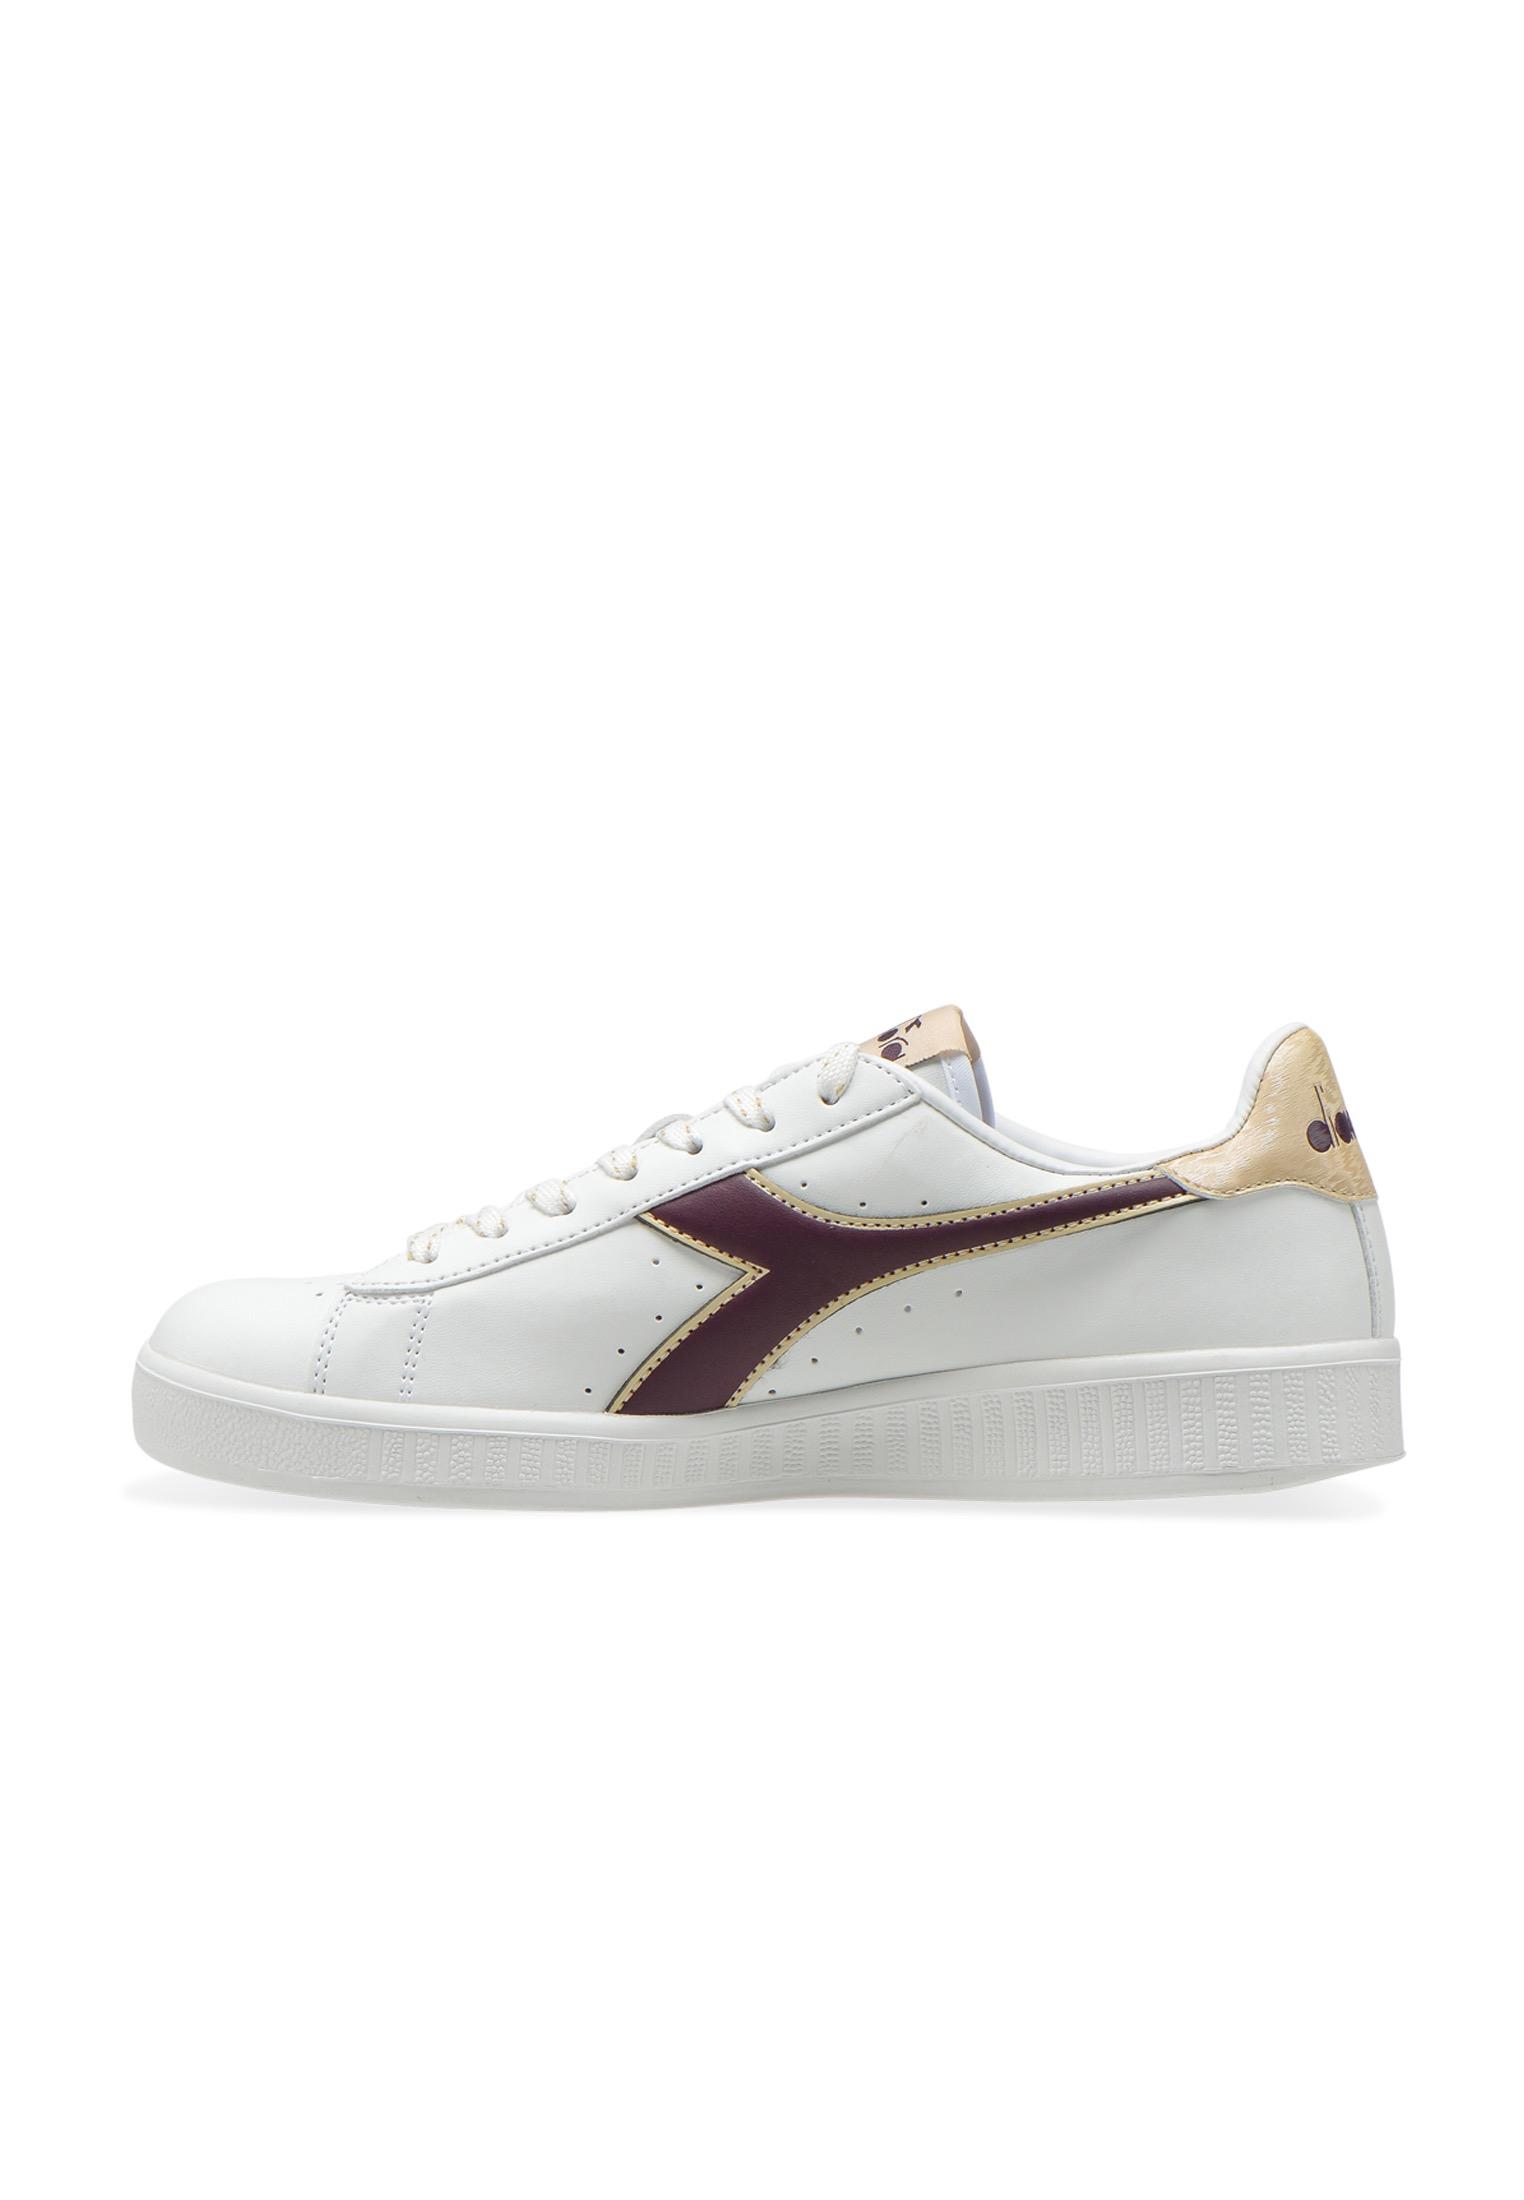 Diadora-Sneakers-GAME-P-WN-para-hombre-y-mujer miniatura 33